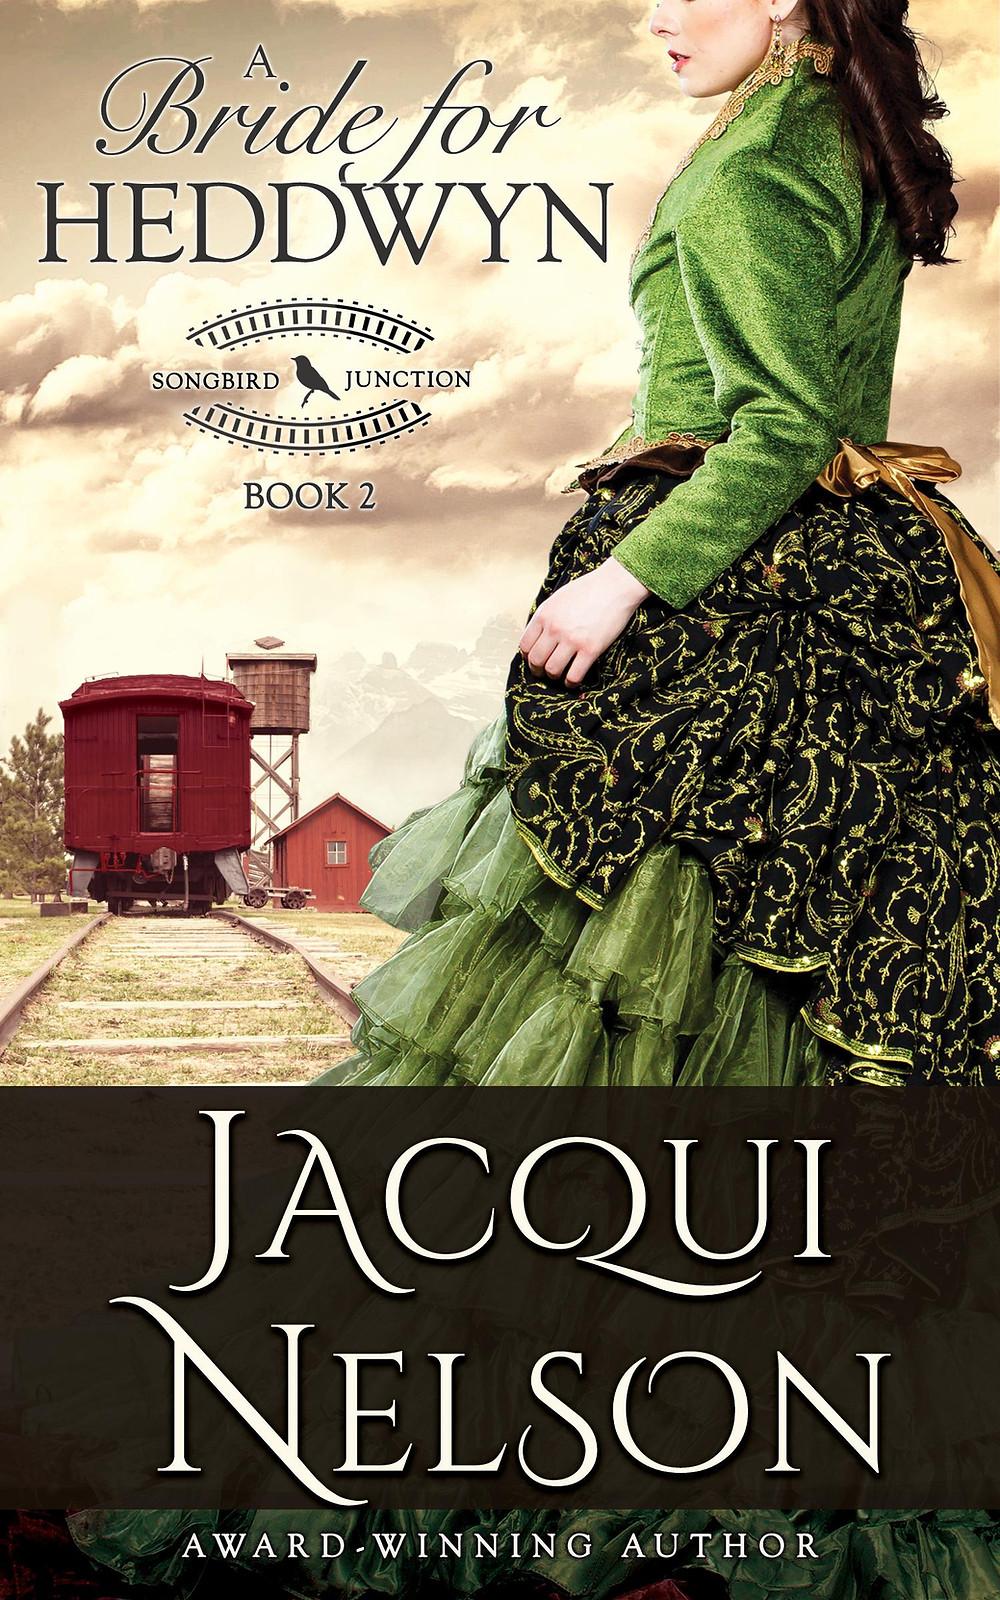 A Bride for Heddwyn by Jacqui Nelson